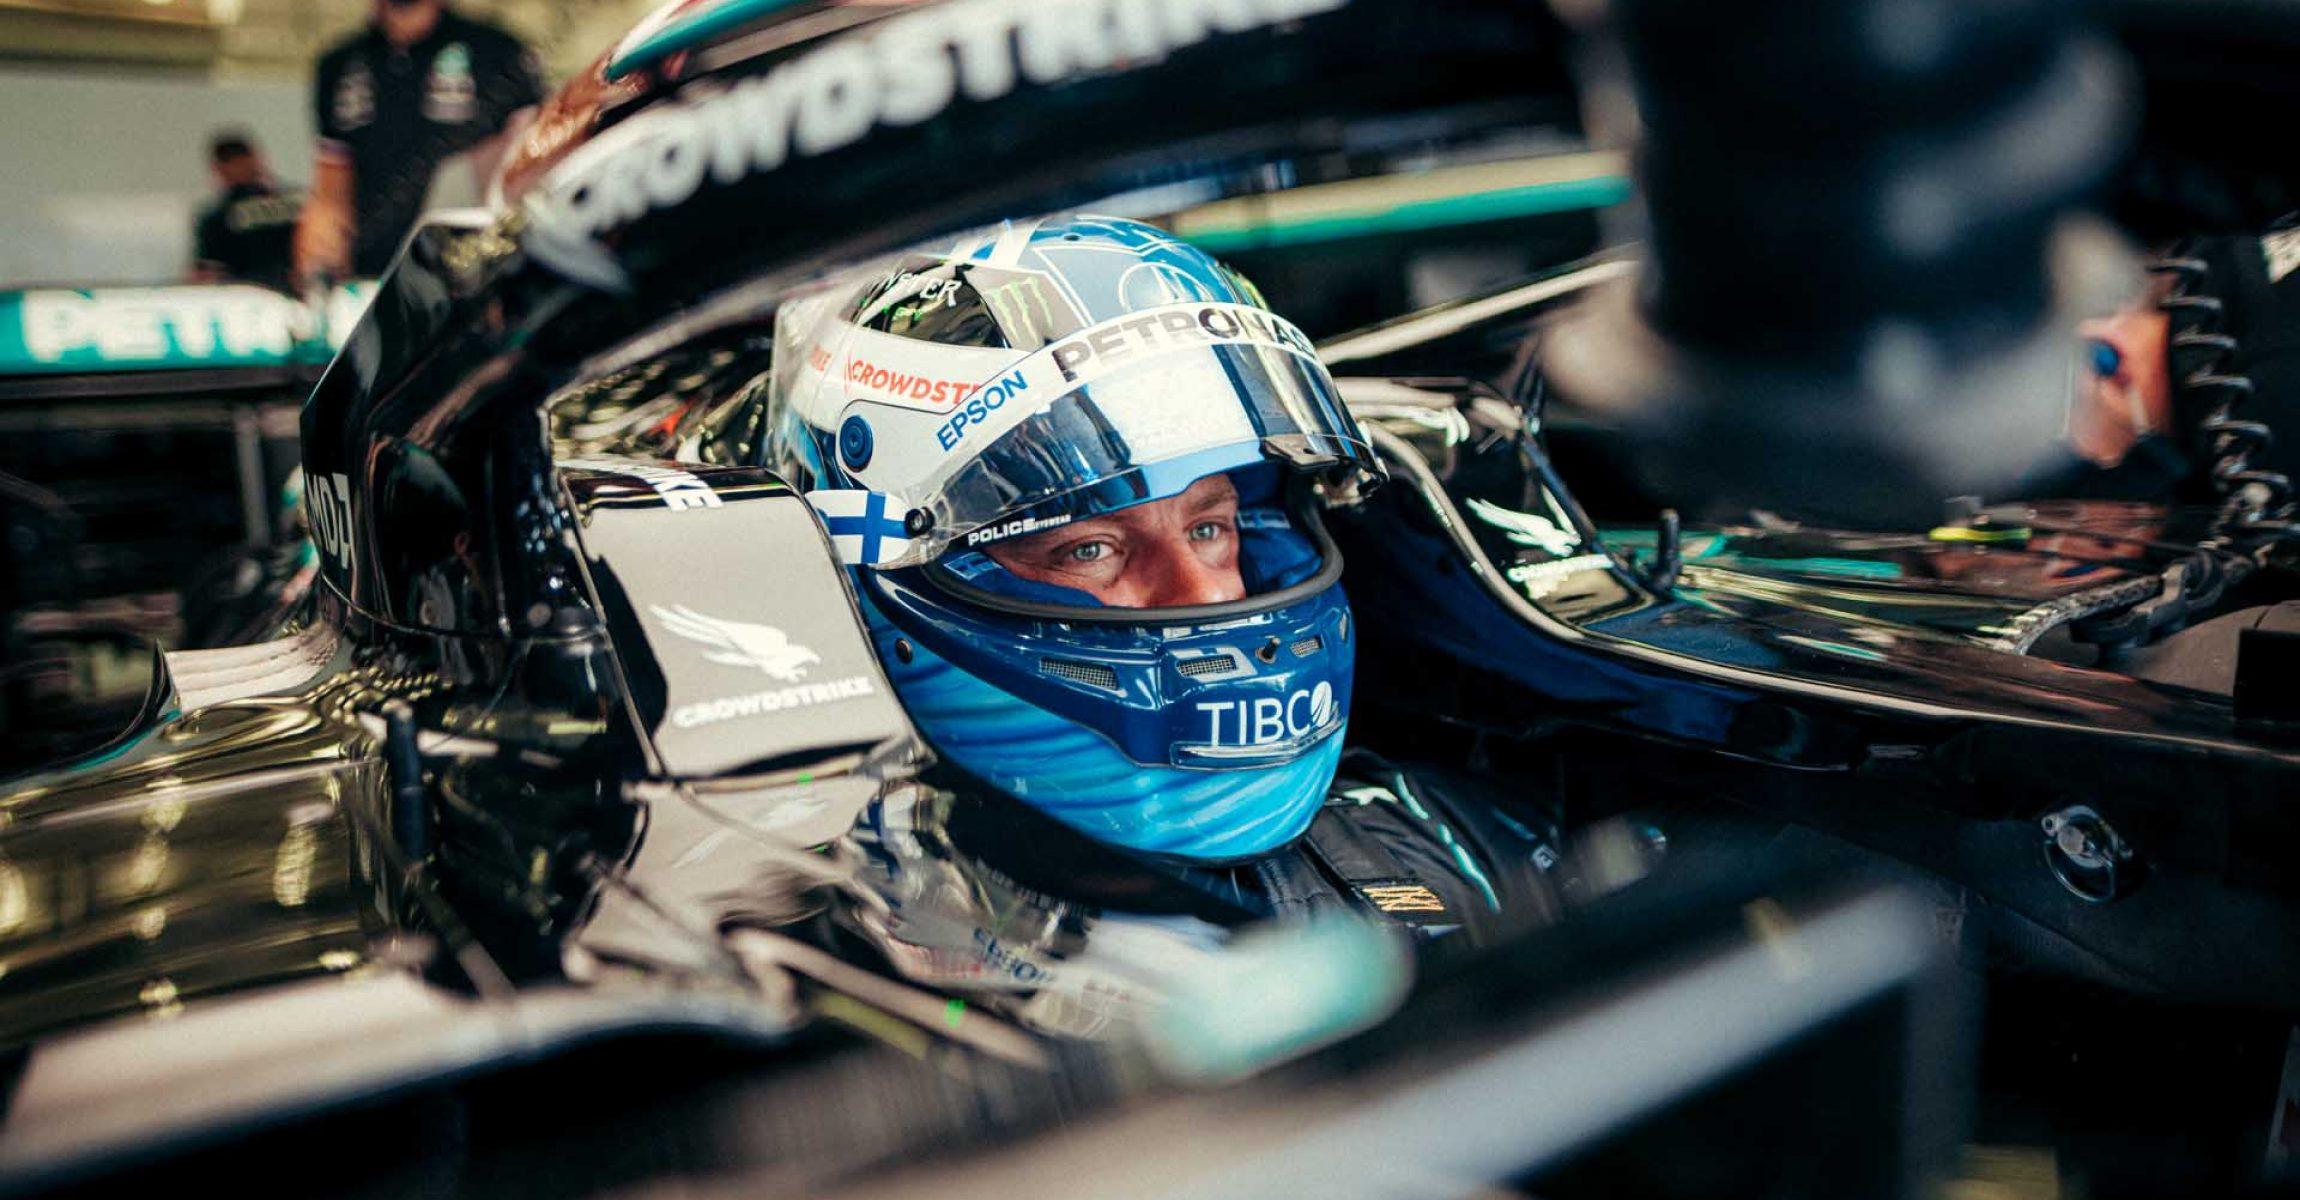 2021 Bahrain Grand Prix, Friday - Sebastian Kawka Valtteri Bottas